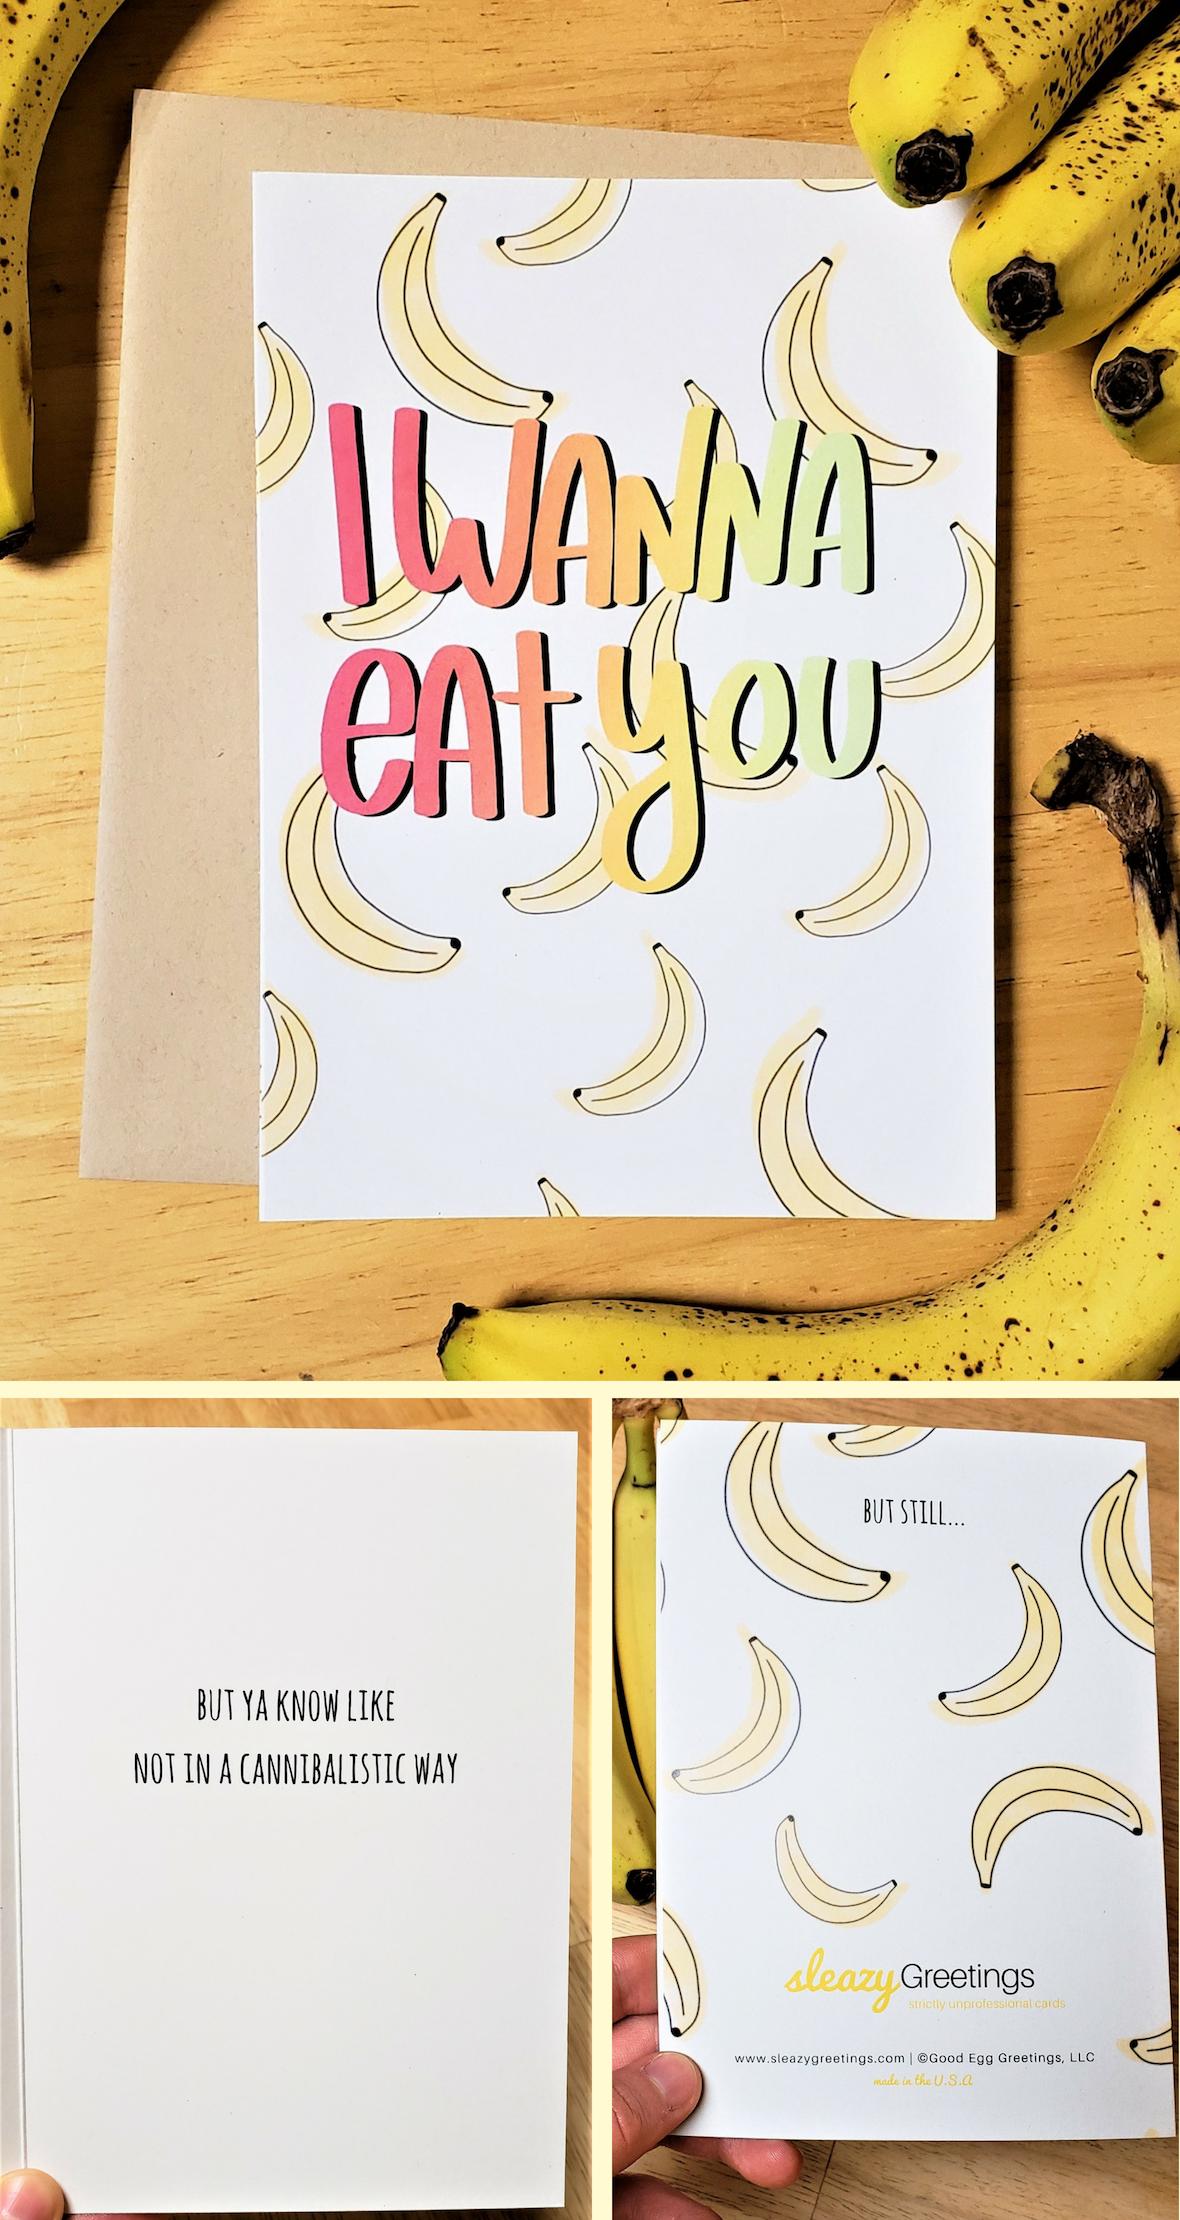 Funny Birthday Card For Him Banana Love Card Sleazy Greetings Birthday Cards For Boyfriend Funny Love Cards Funny Birthday Cards